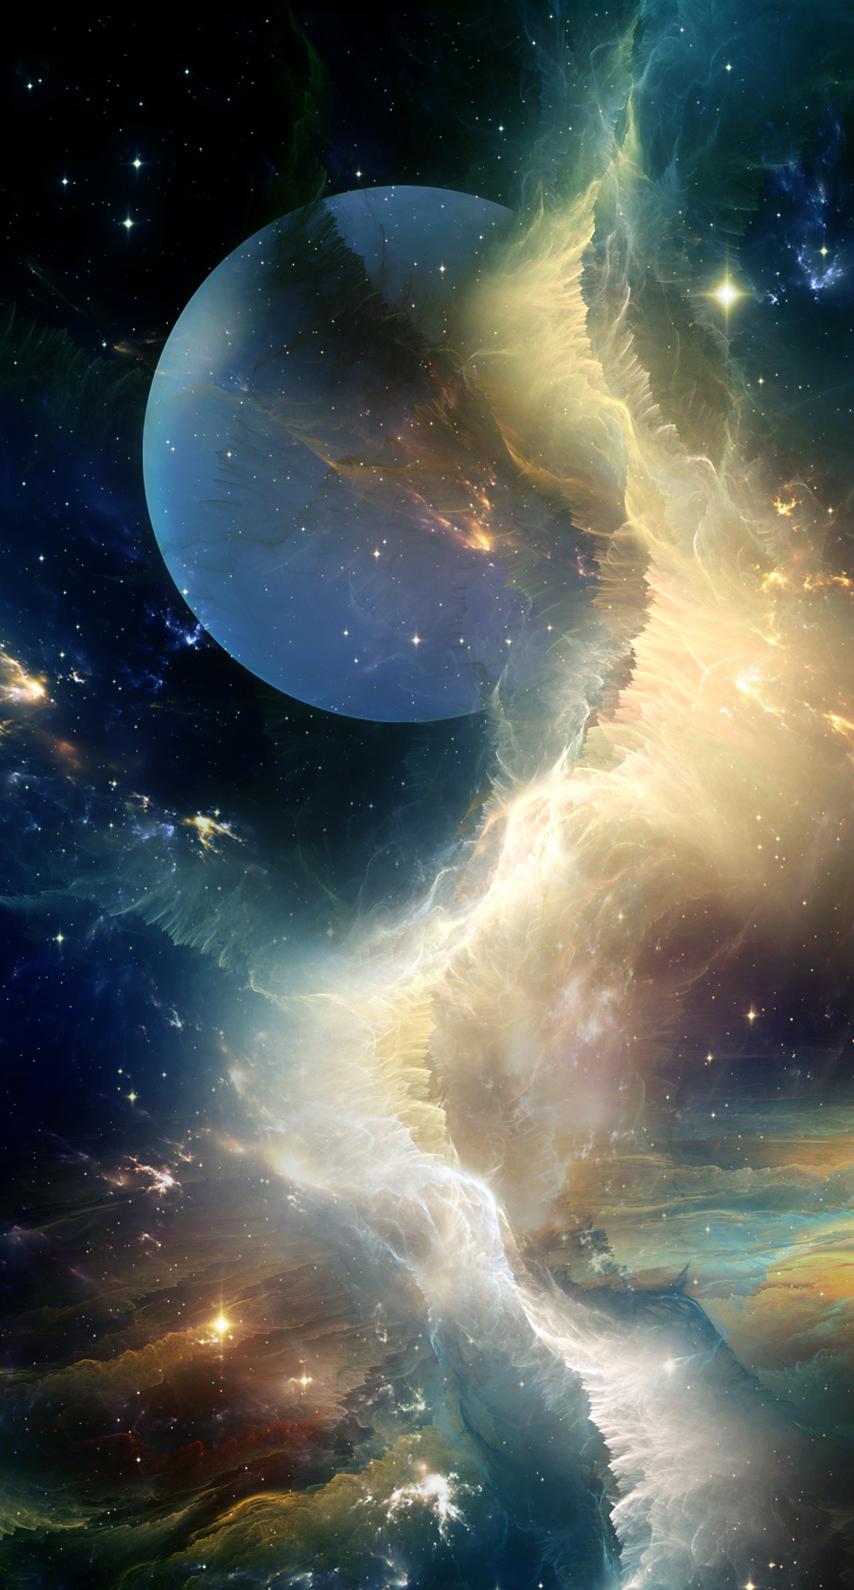 nebula, infinity, cosmos, constellation, ball-shaped, exploration, stellar, surreal, astrology